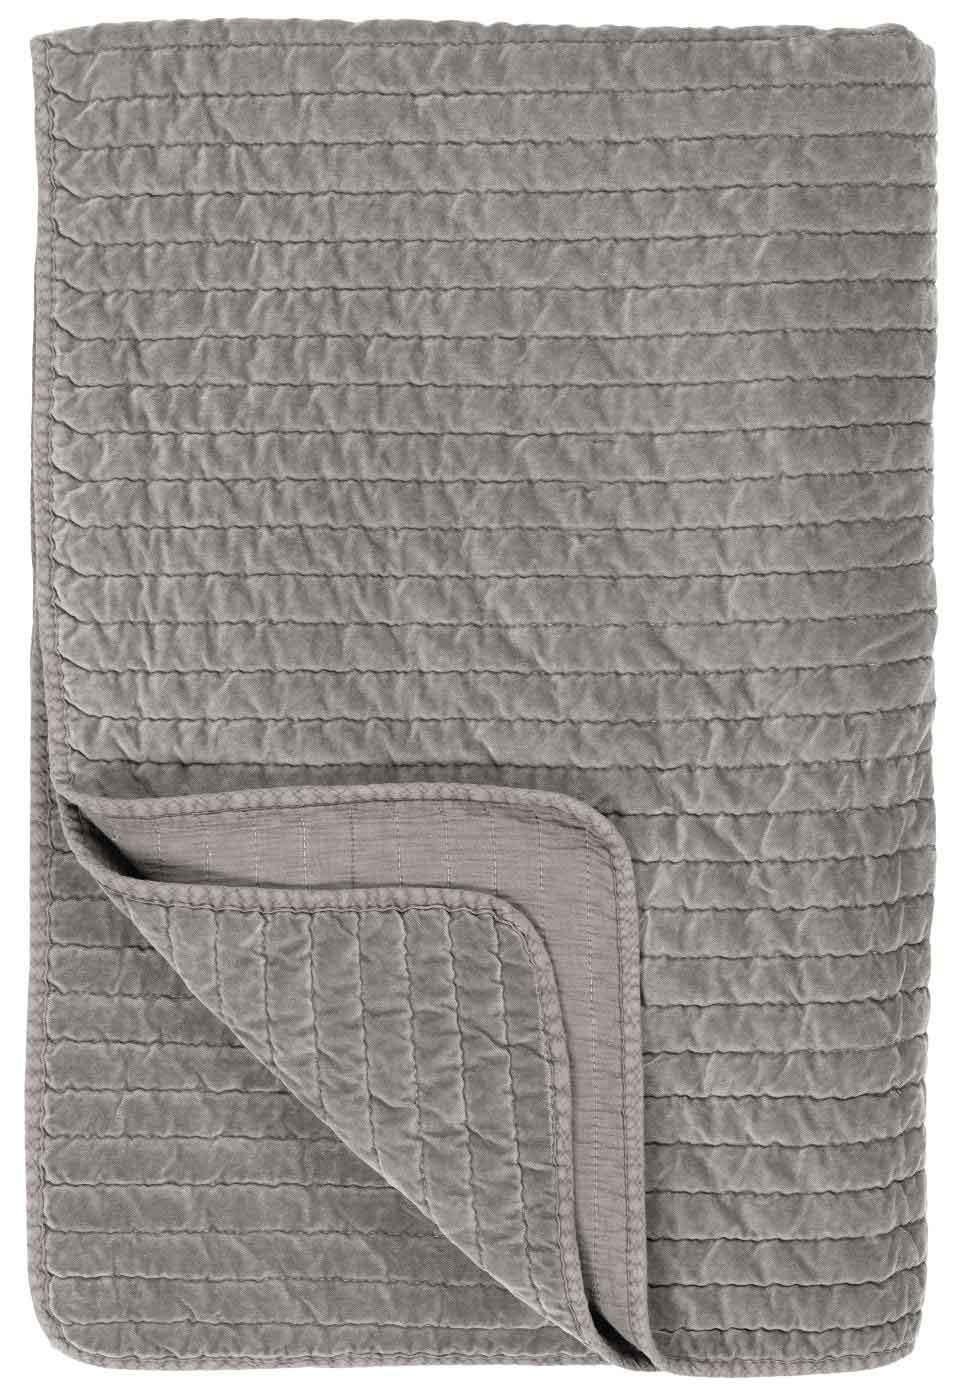 IB LAURSEN Quilt sengetæppe - grå velour